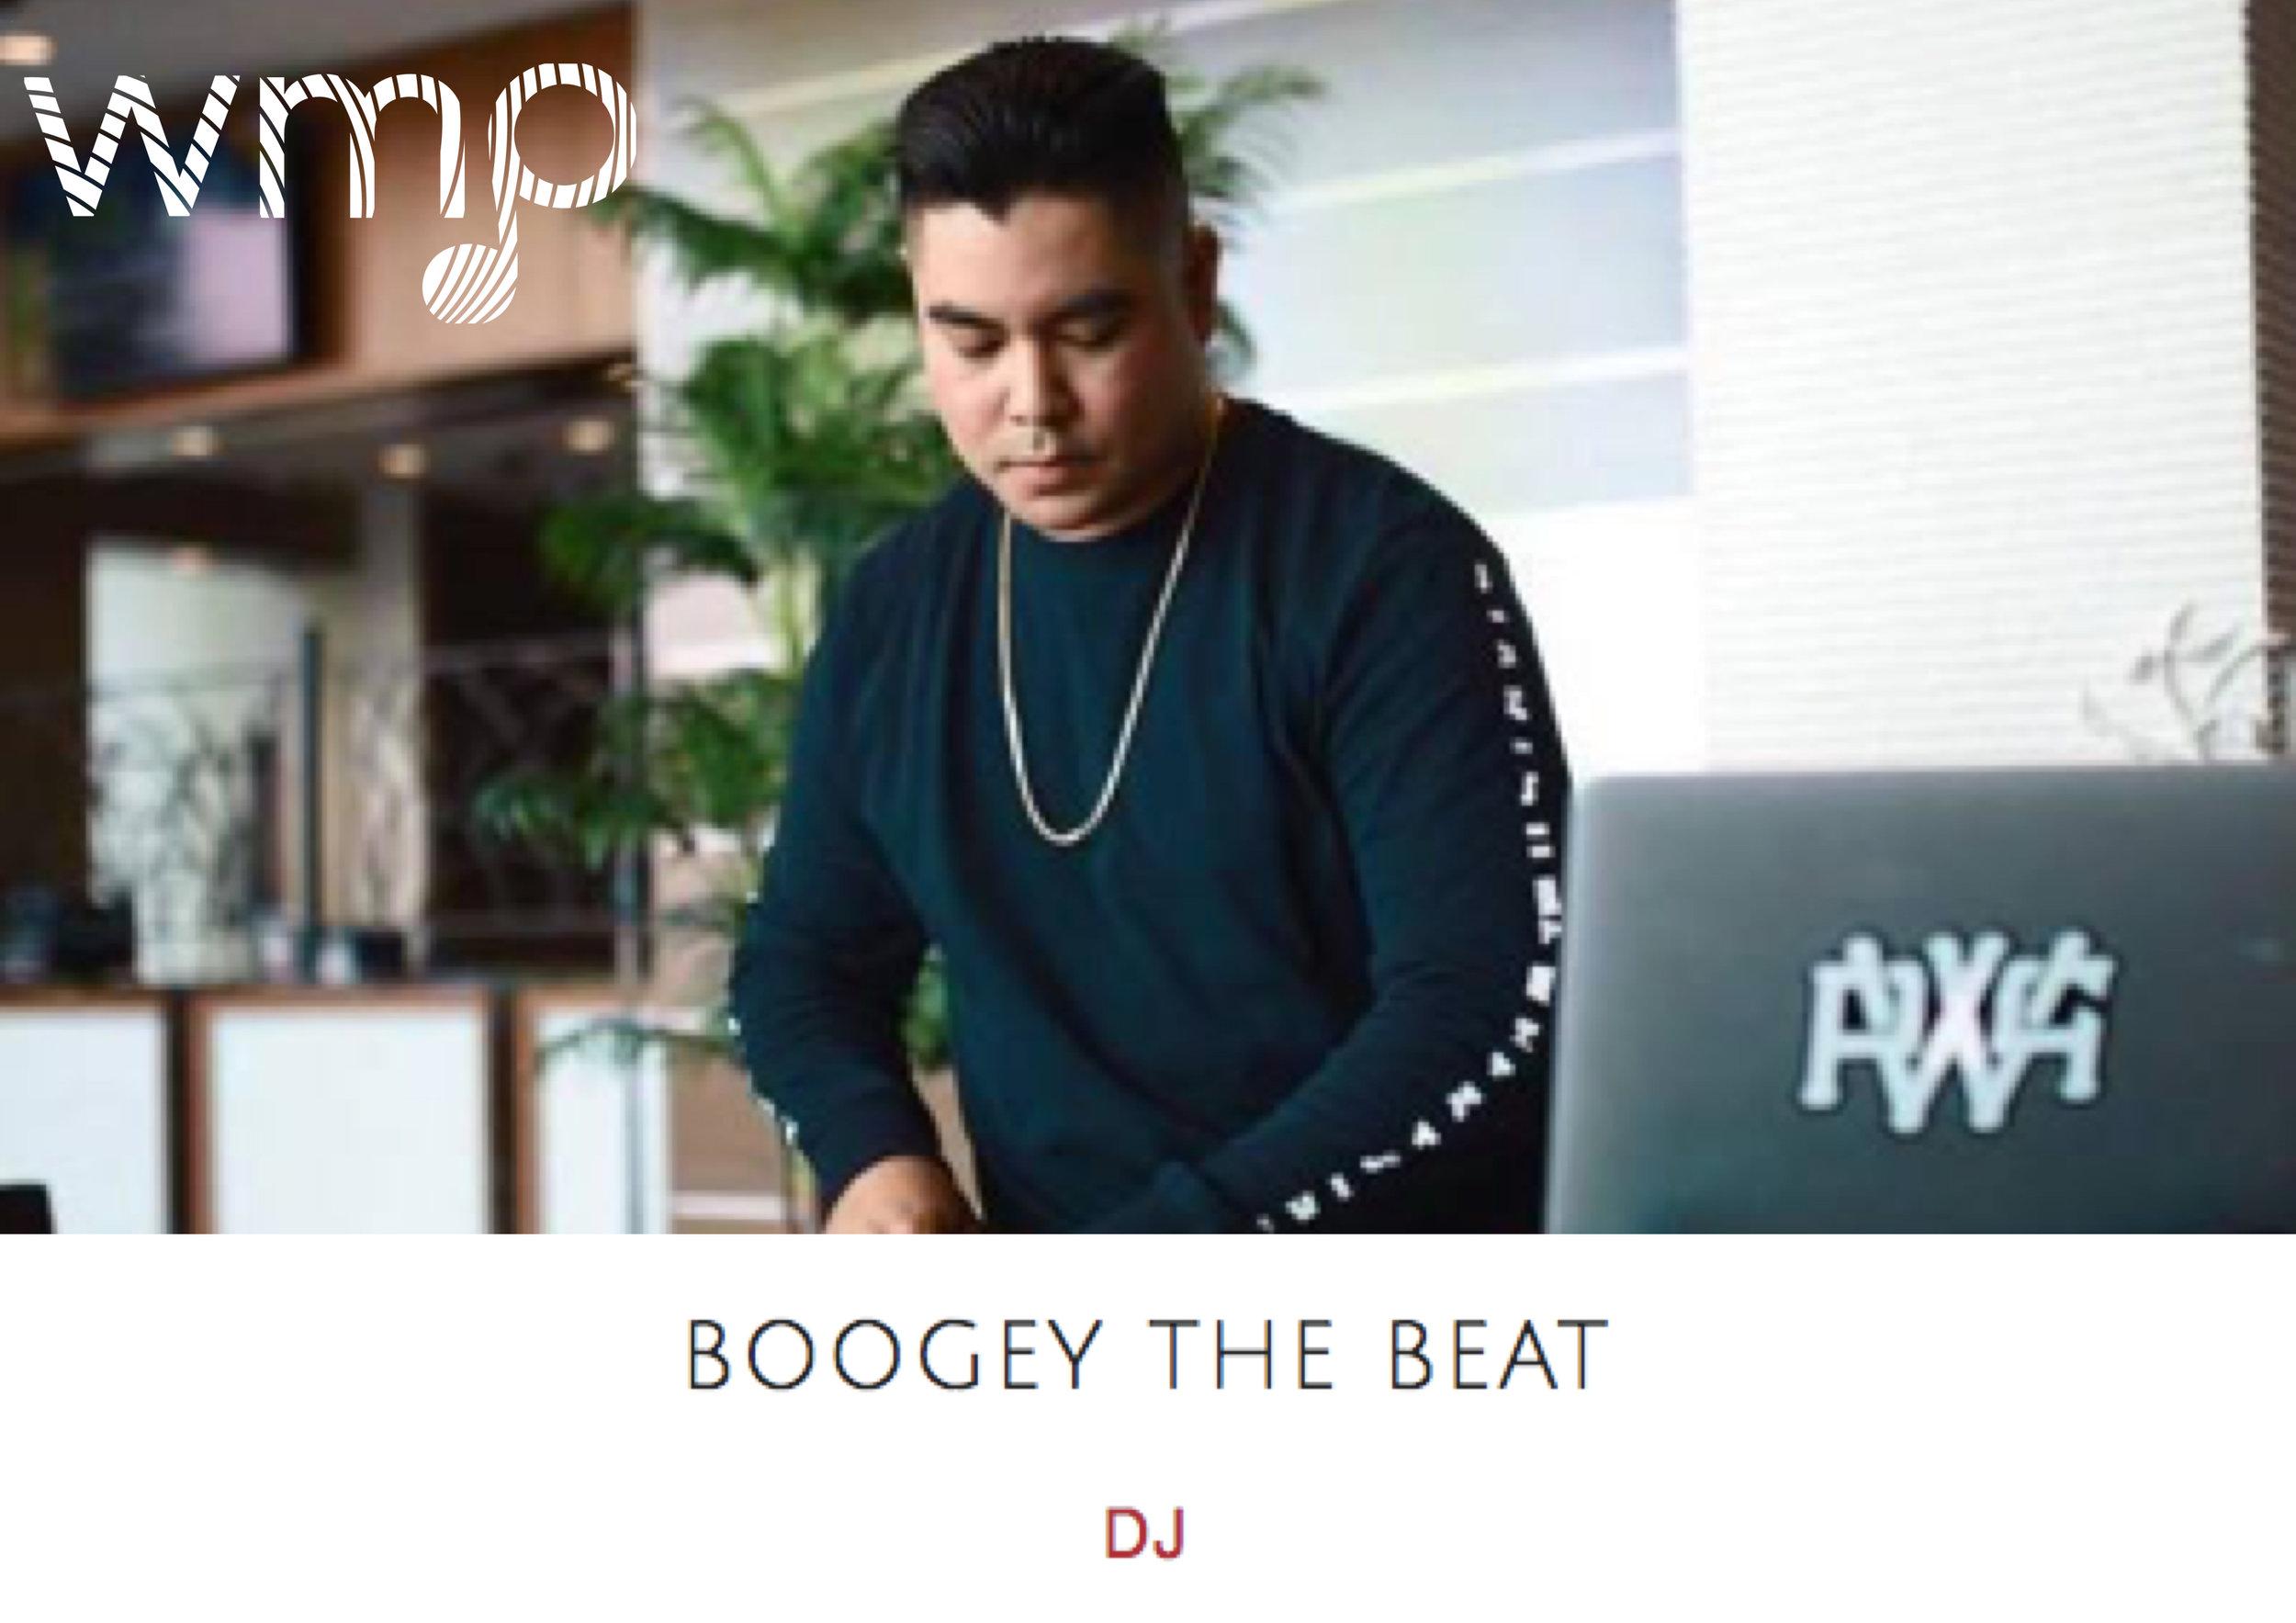 Top10-Boogey The Beat.jpg